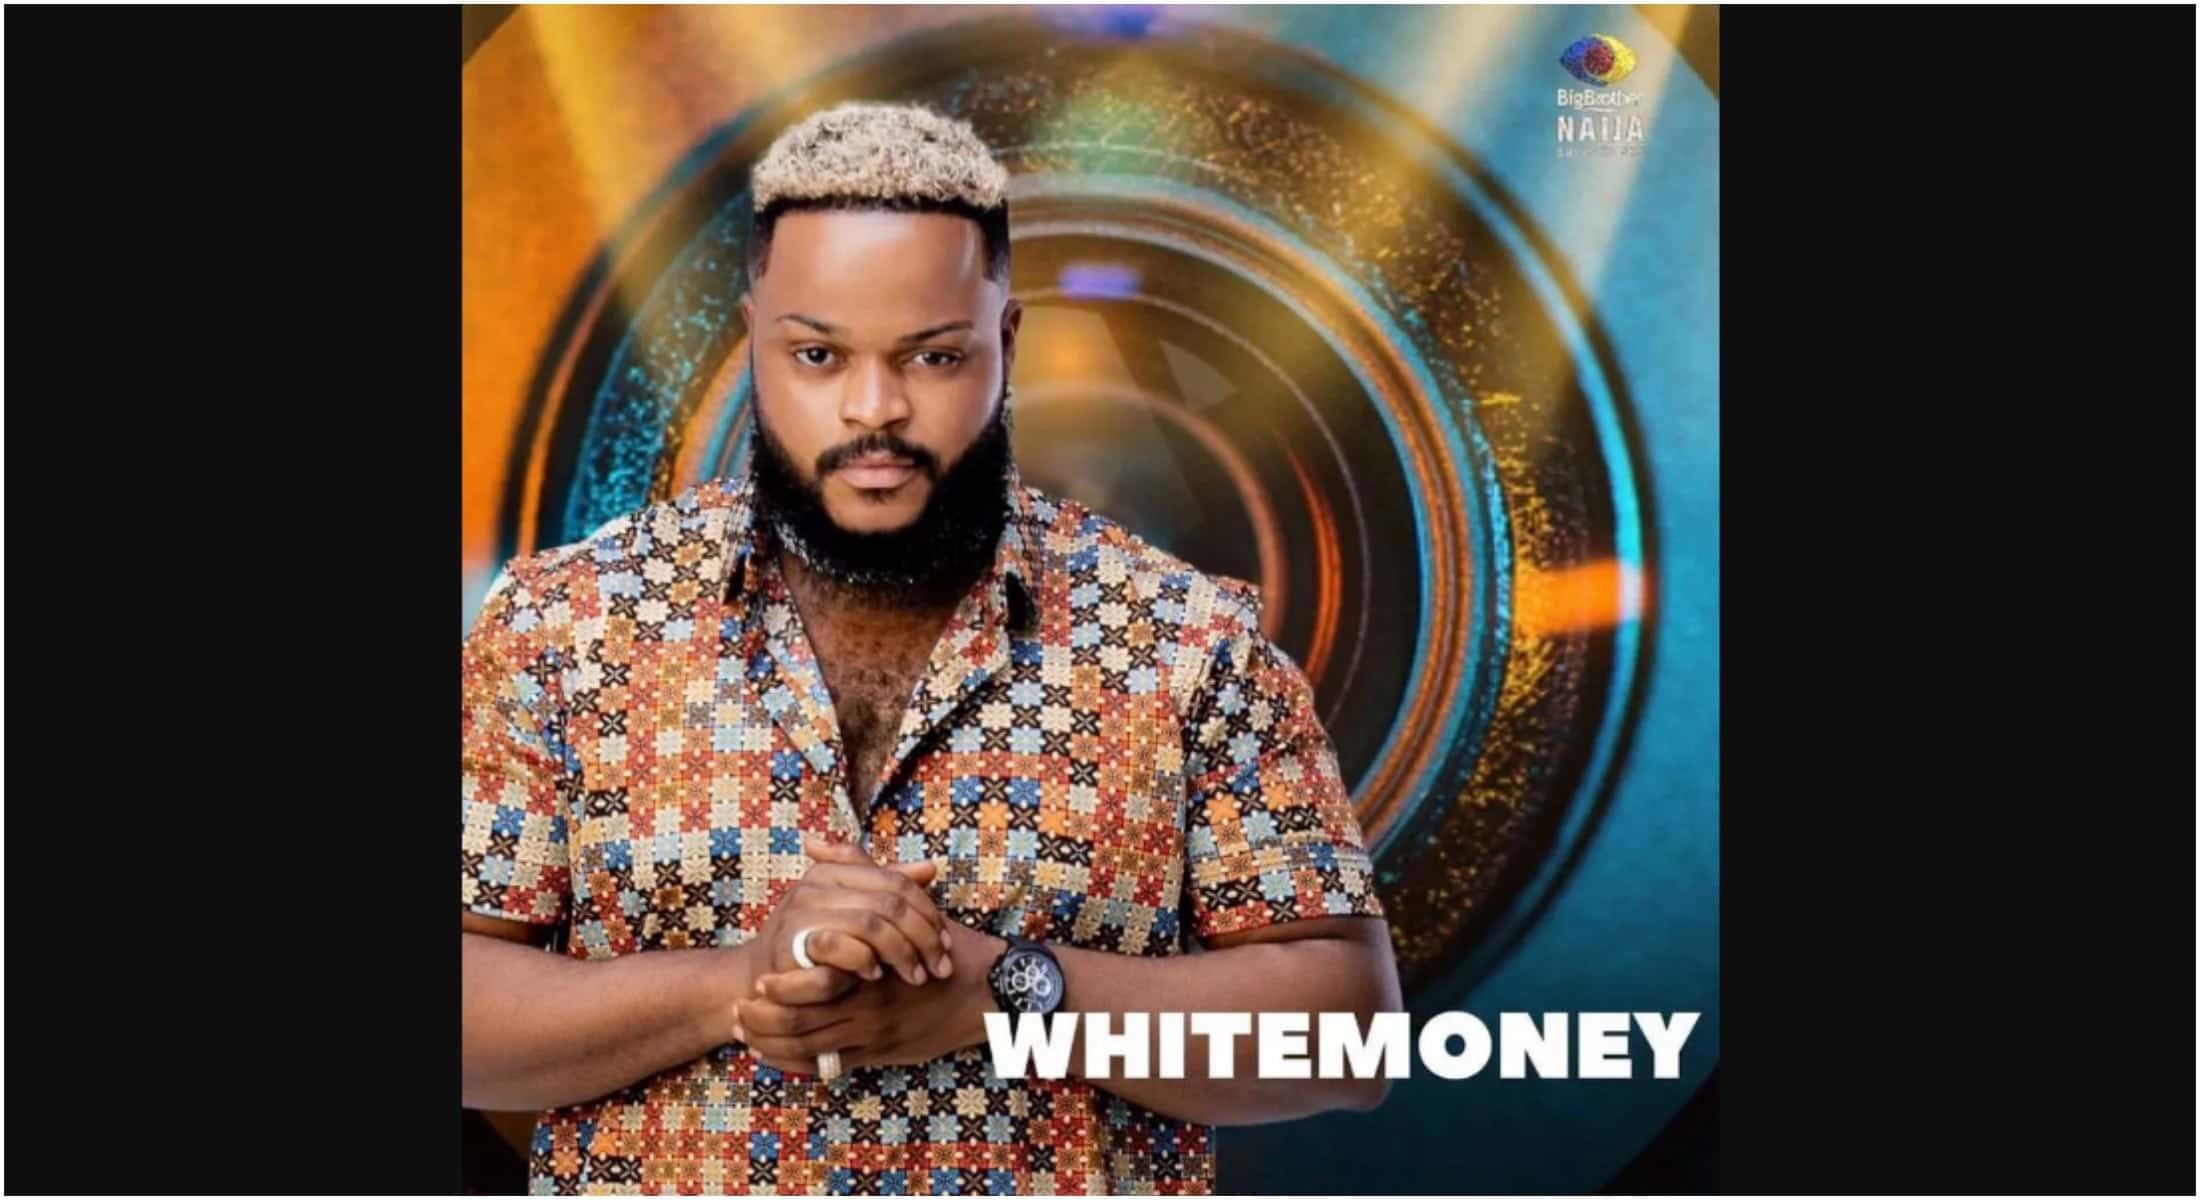 Whitemoney biography, age, net worth